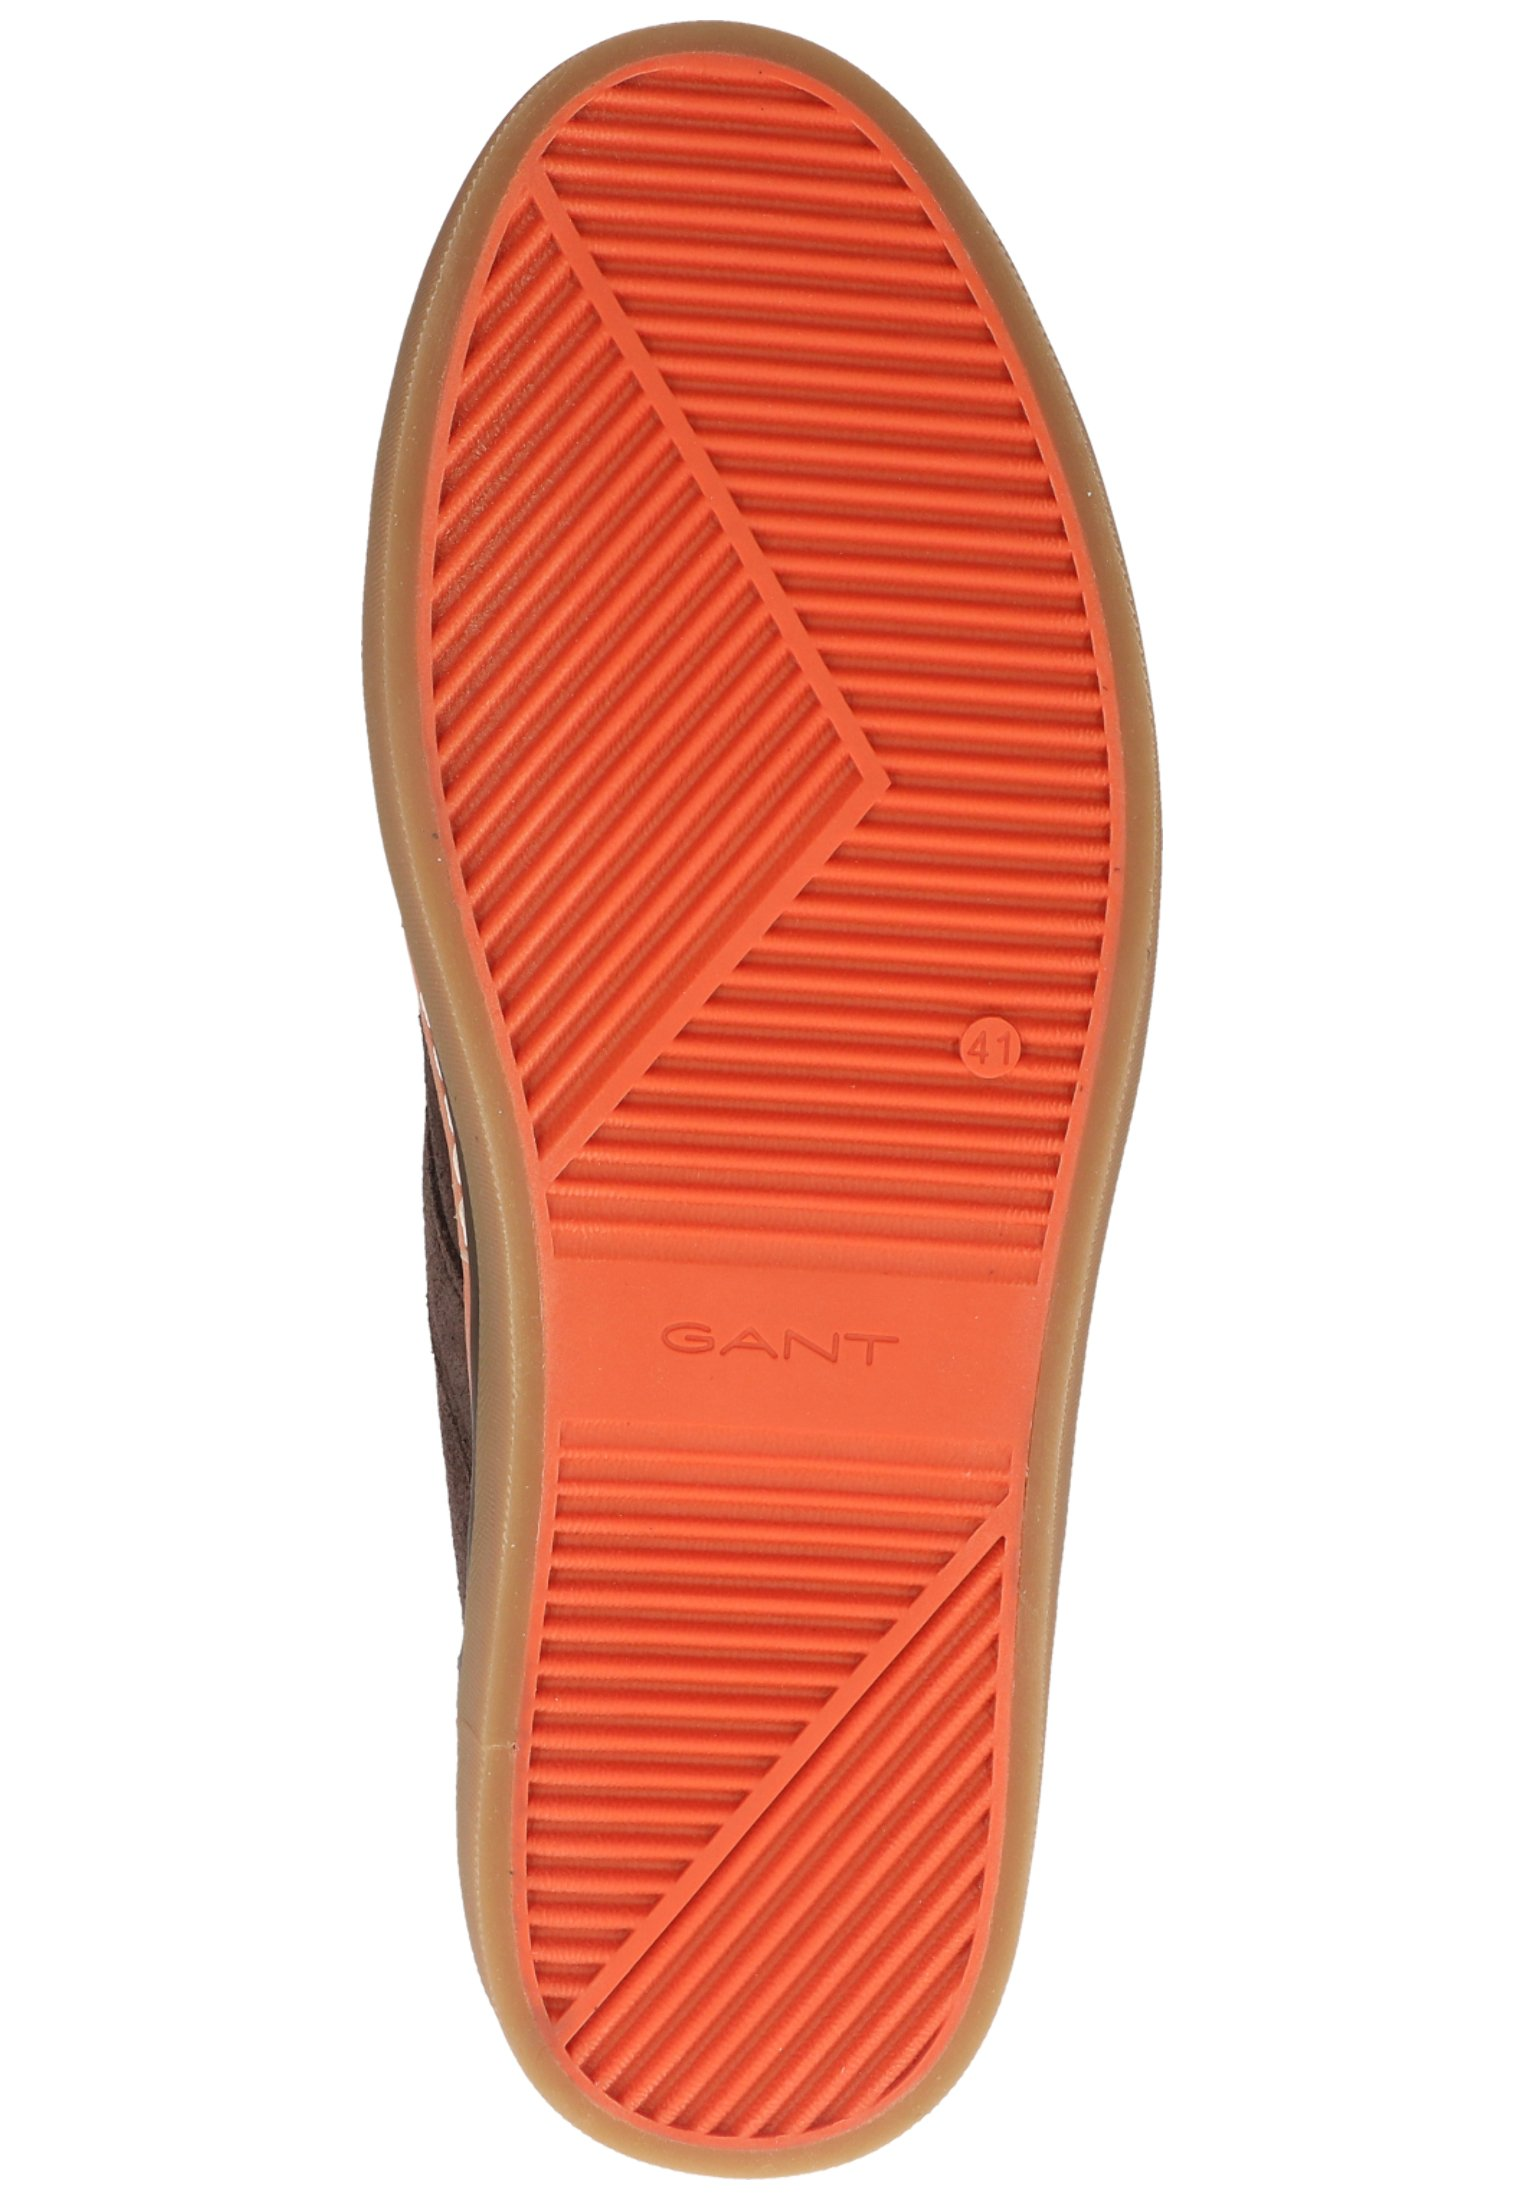 GANT PREPVILLE - Sneaker low - espresso g464/dunkelbraun - Herrenschuhe 64k85